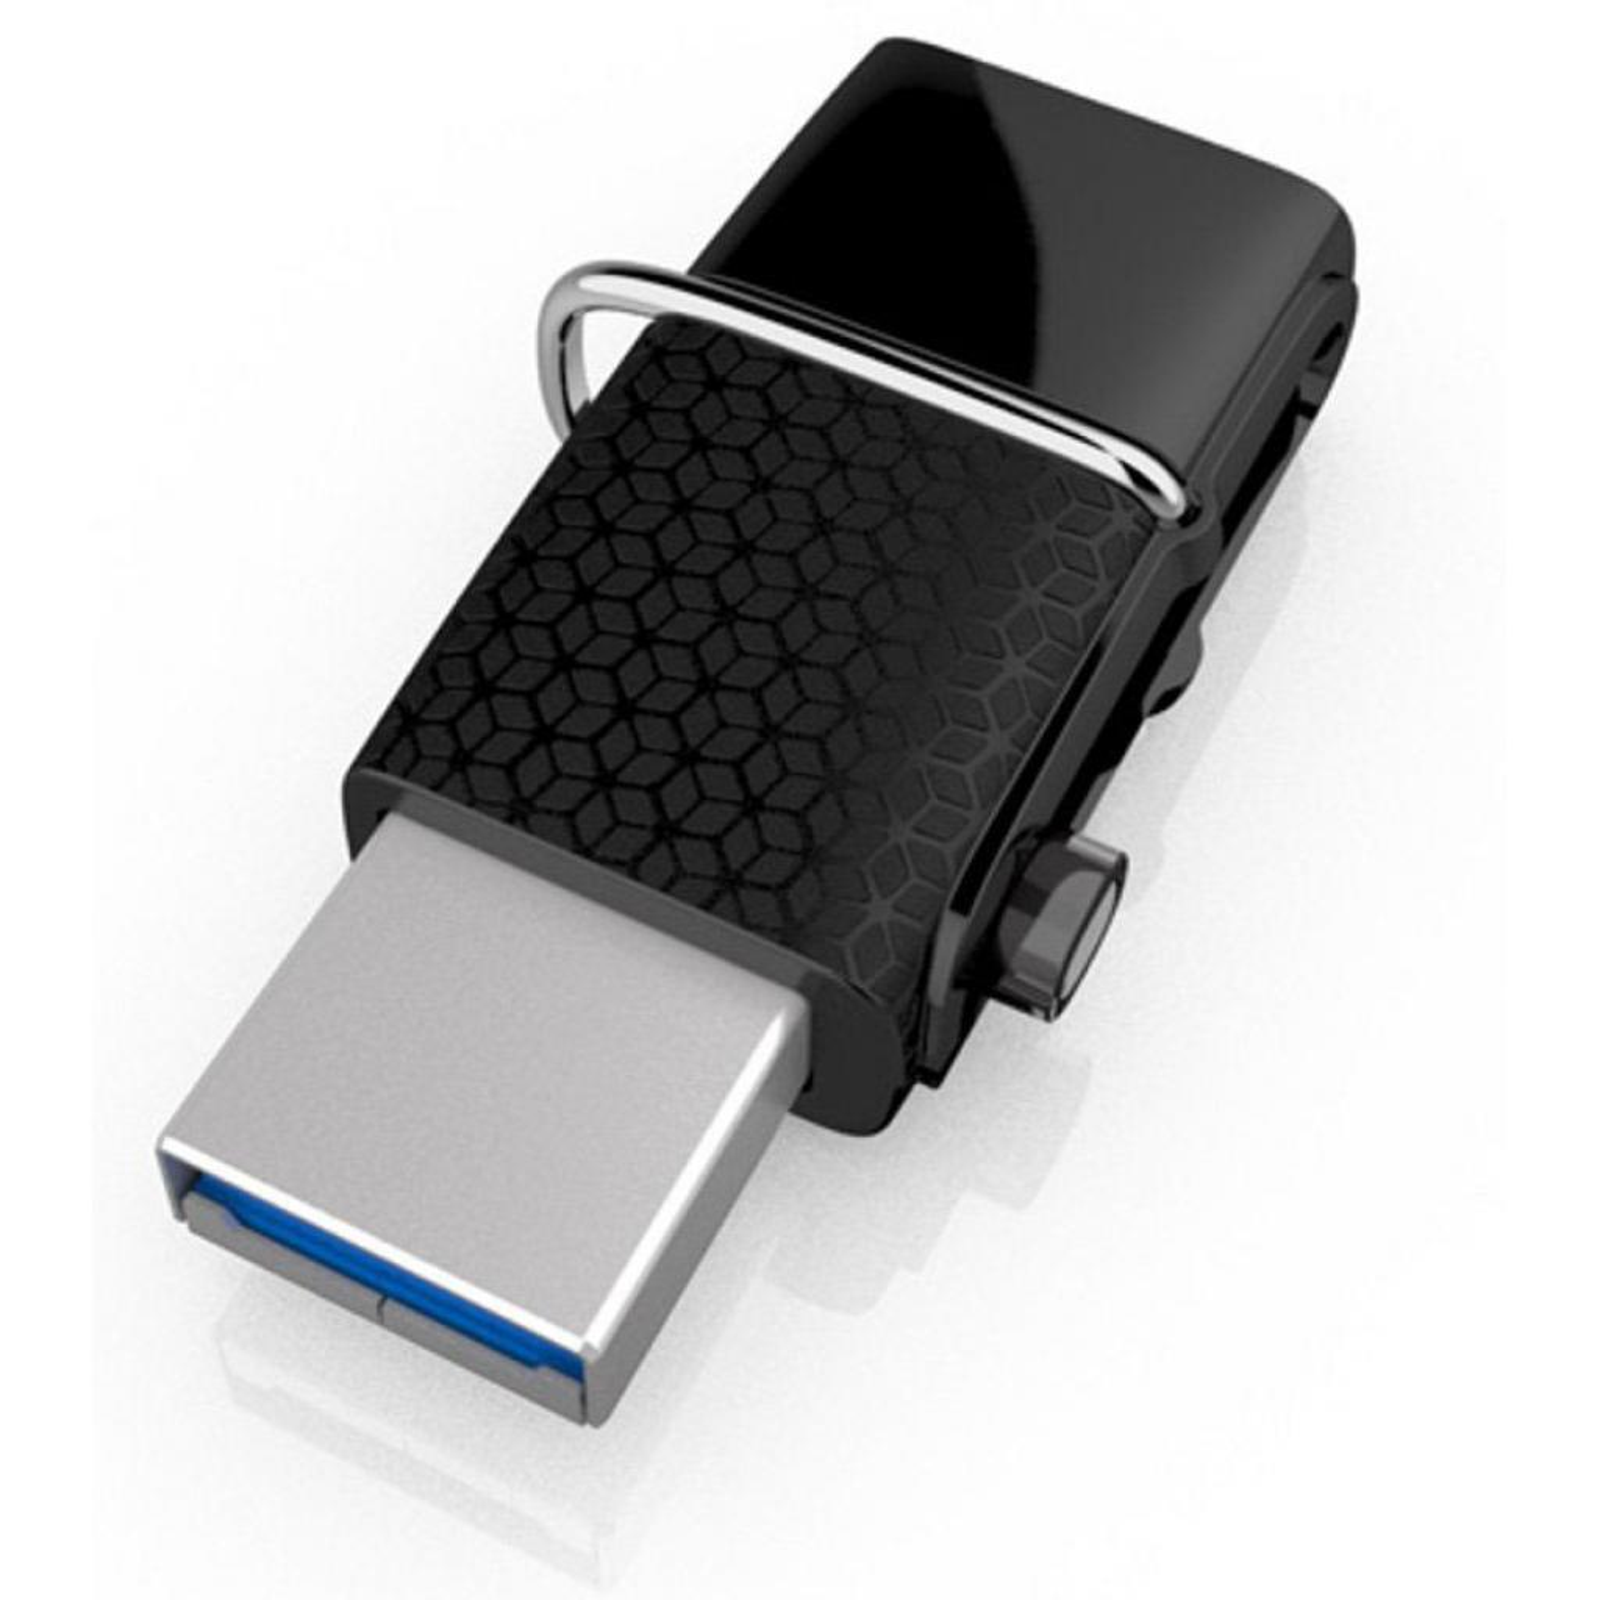 USB флеш накопитель SanDisk 32GB Ultra Dual Drive m3.0 White-Gold USB 3.0/OTG (SDDD3-032G-G46GW) изображение 4